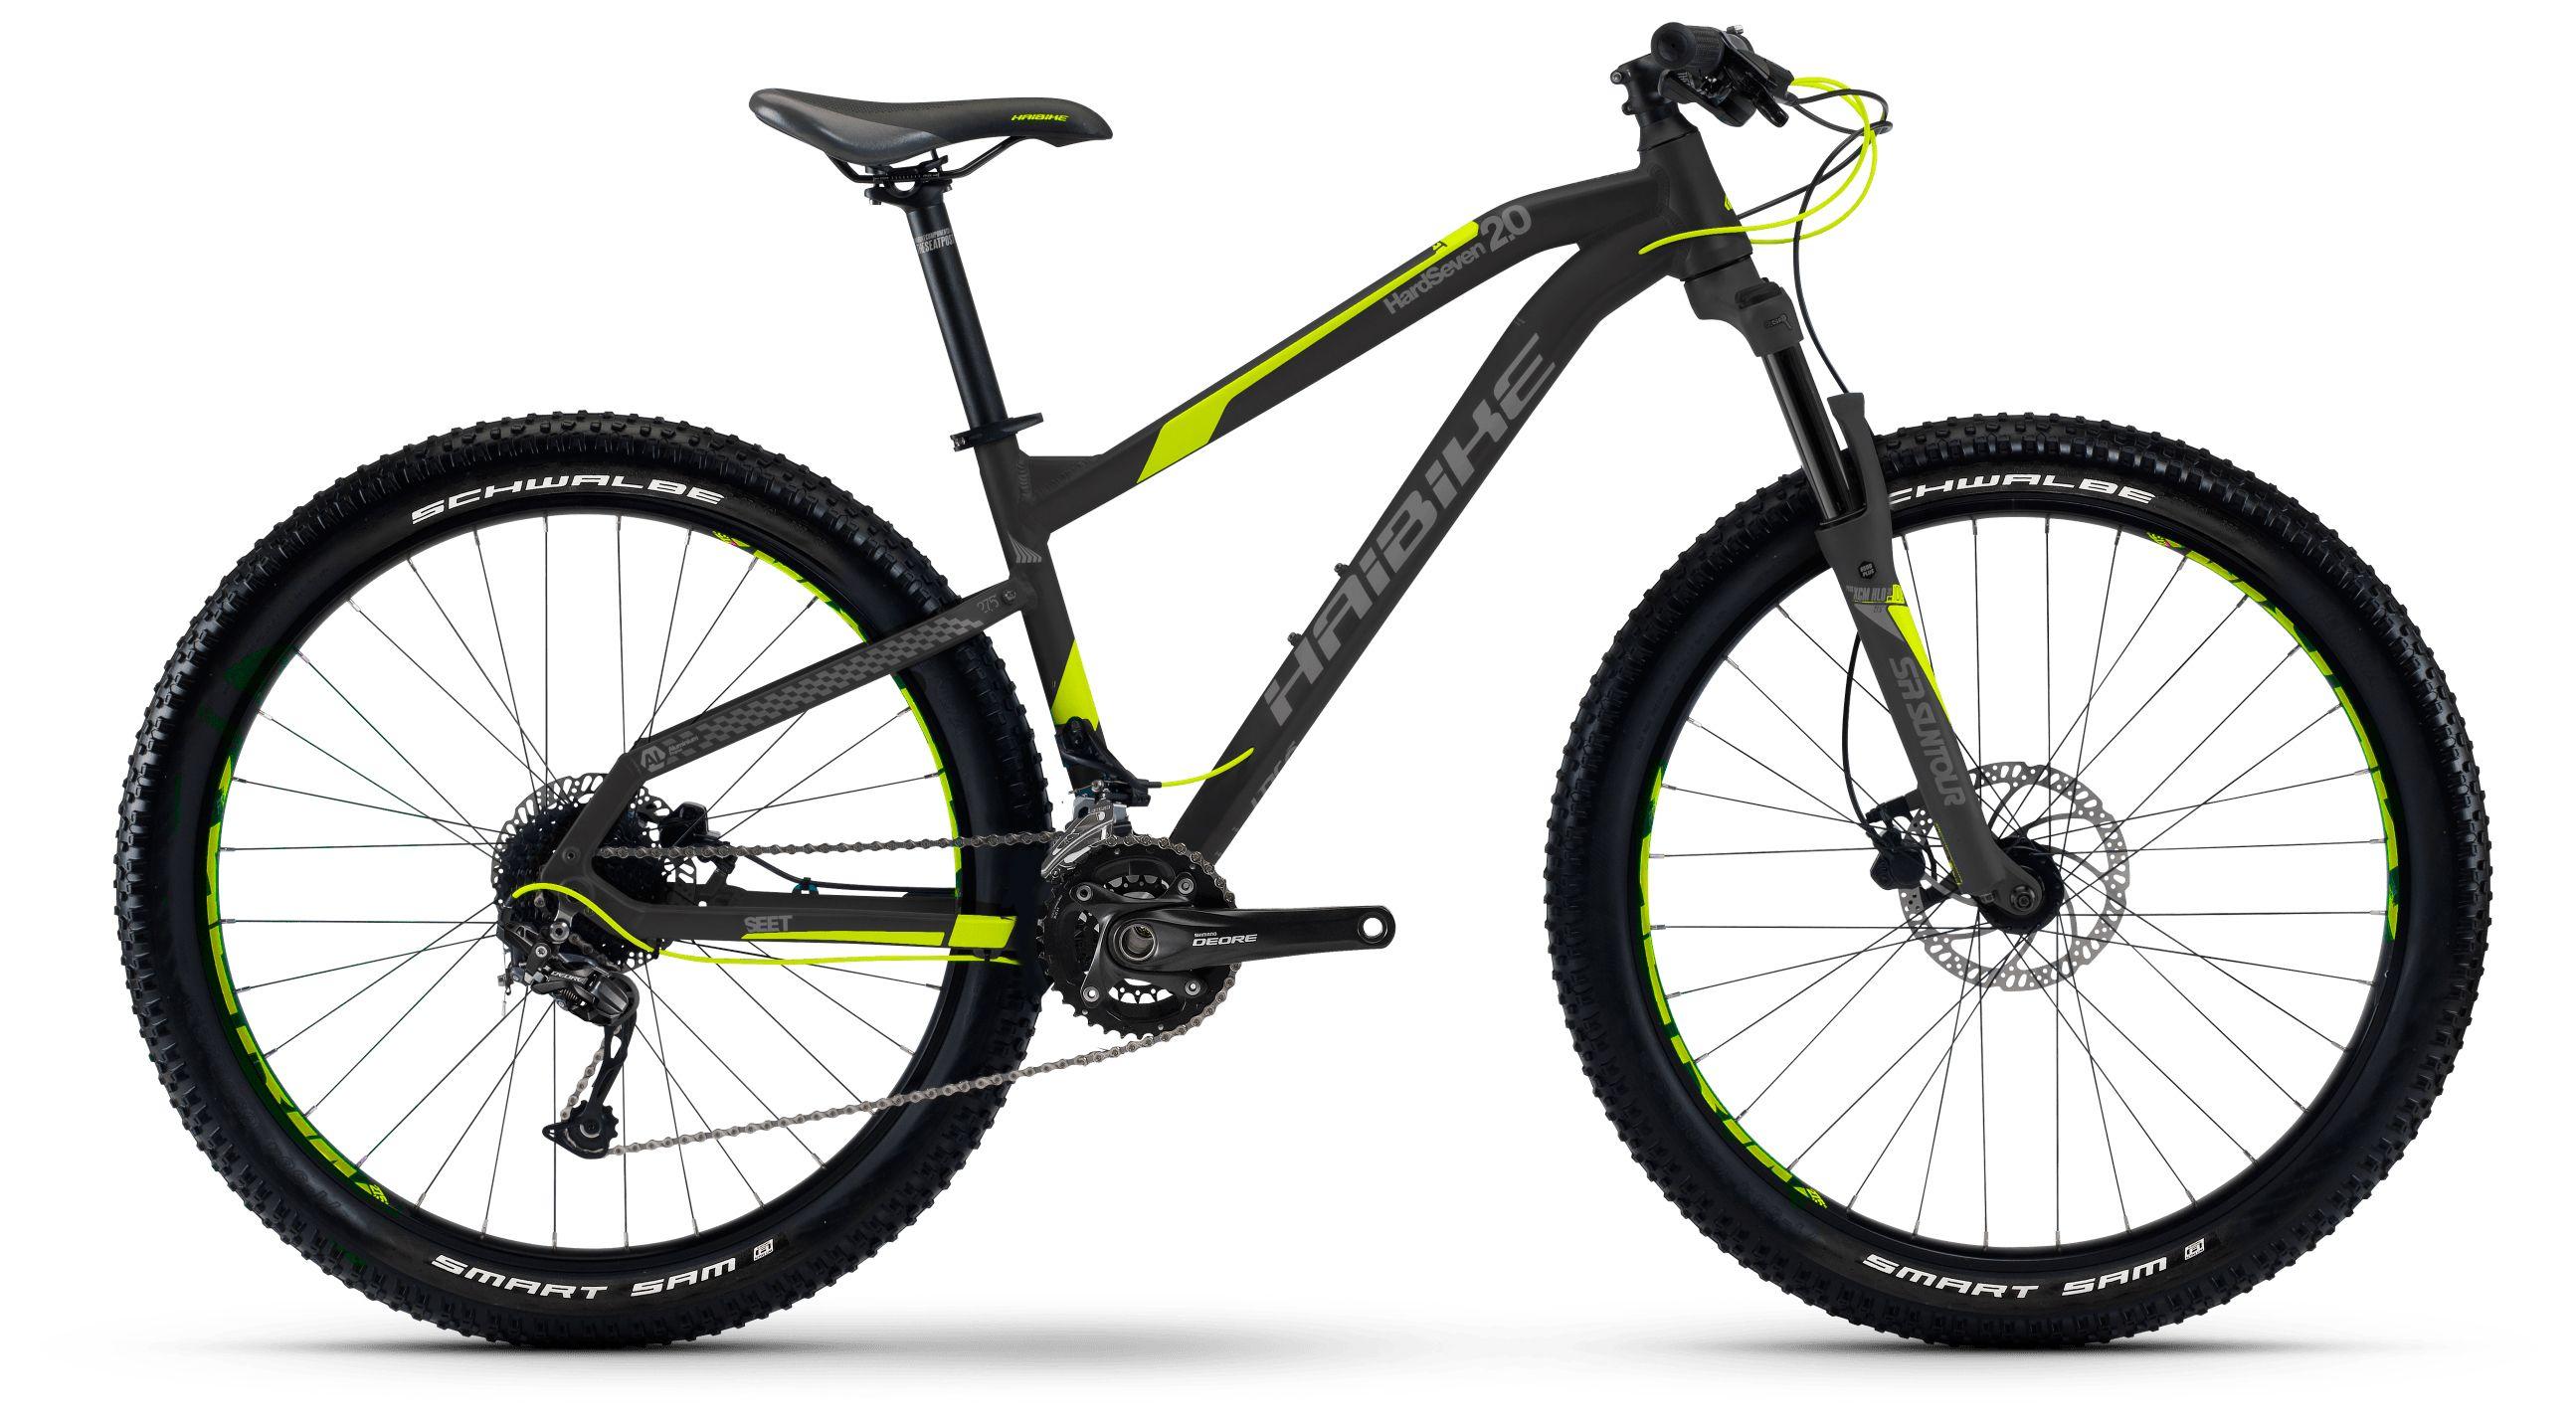 Велосипед Haibike Seet HardSeven Plus 2.0 2017,  Горные  - артикул:283648